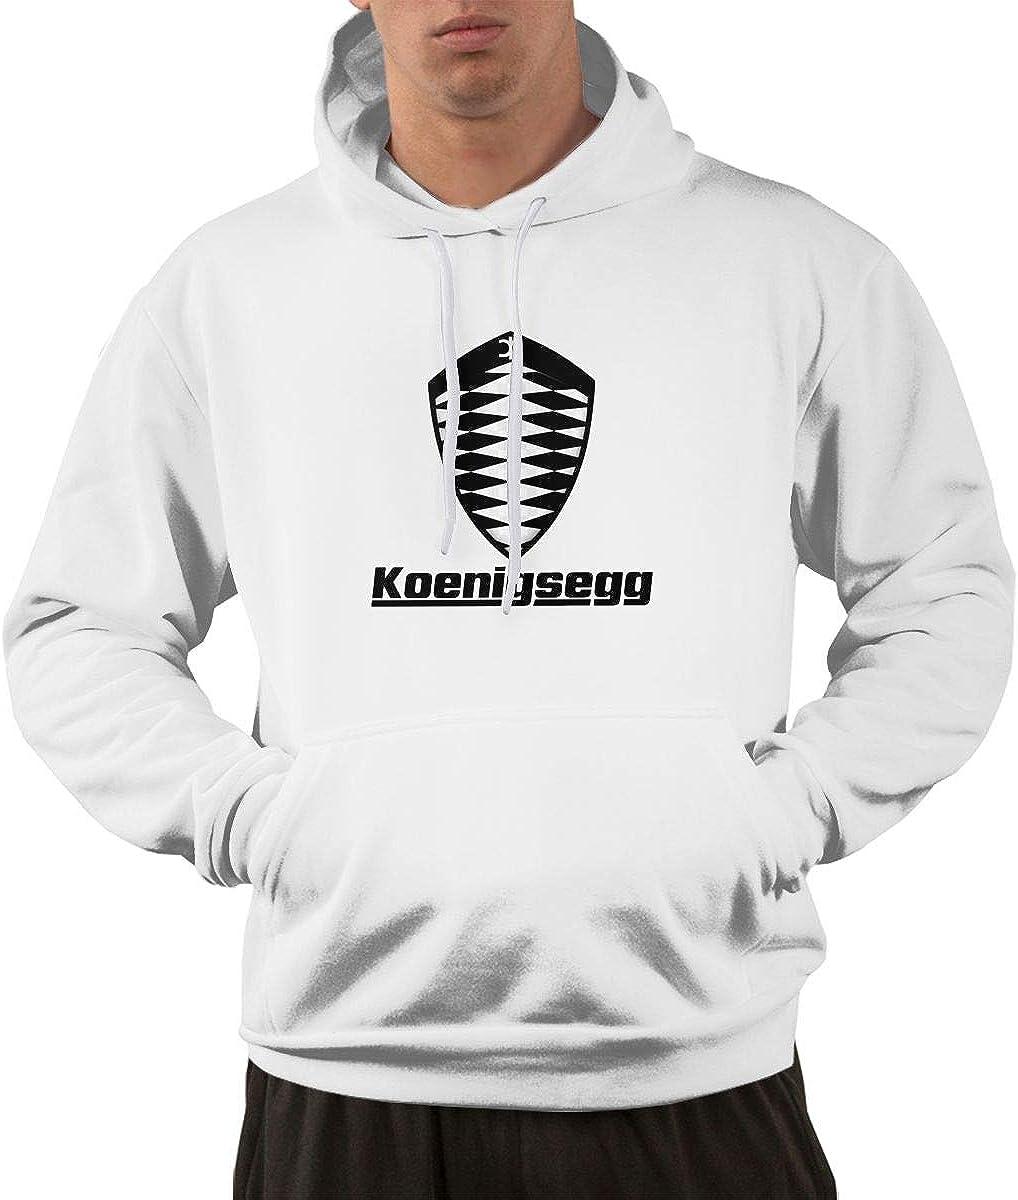 STDONE Mans Stylish Koenigsegg Automotive AB-2 Sweatshirt Black